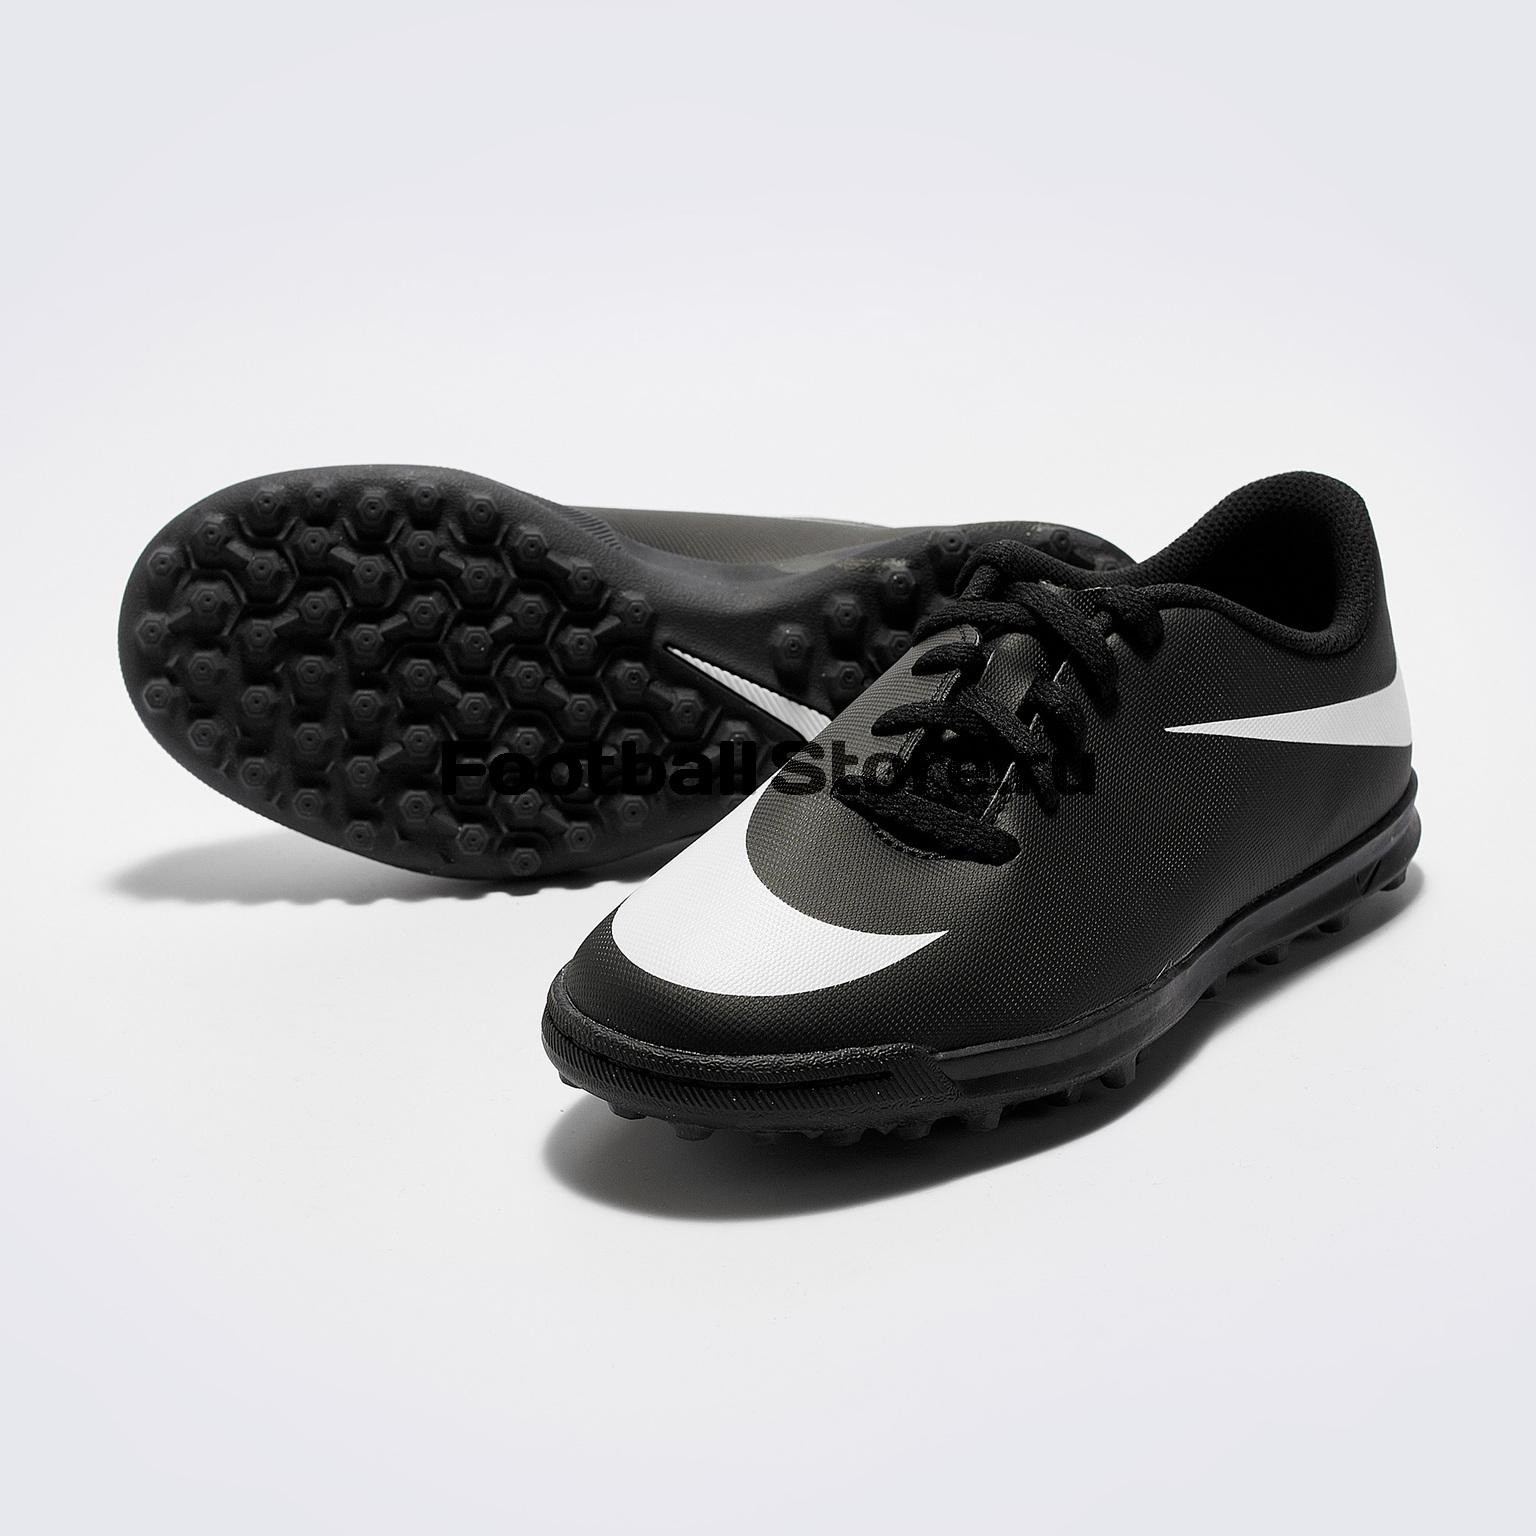 цены на Шиповки детские Nike Bravata II TF 844440-001  в интернет-магазинах